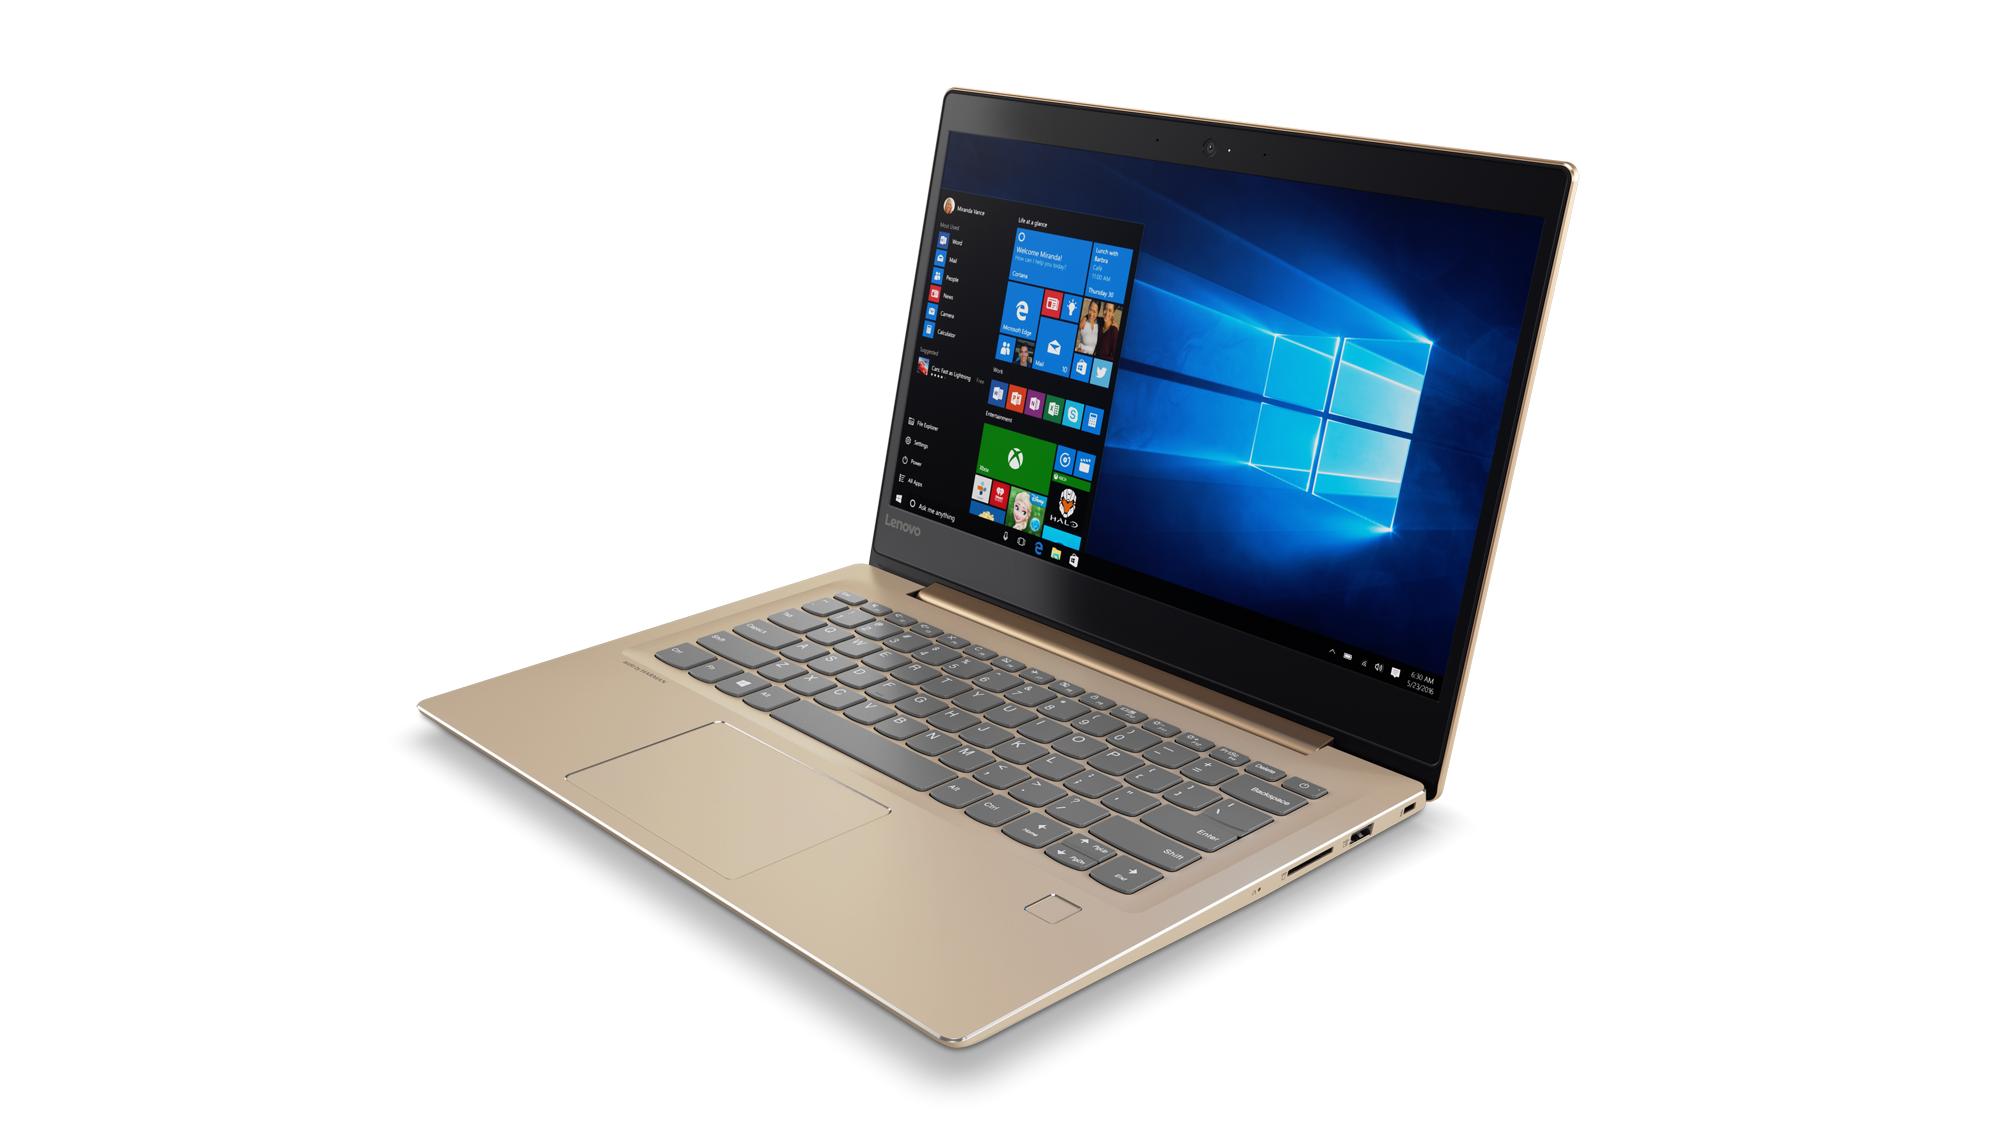 "Lenovo IdeaPad 520S-14IKB i7-7500U 3,50GHz/8GB/SSD 128GB+HDD 1TB/14"" FHD/IPS/AG/GeForce 2GB/WIN10 zlatá 80X2002VCK"